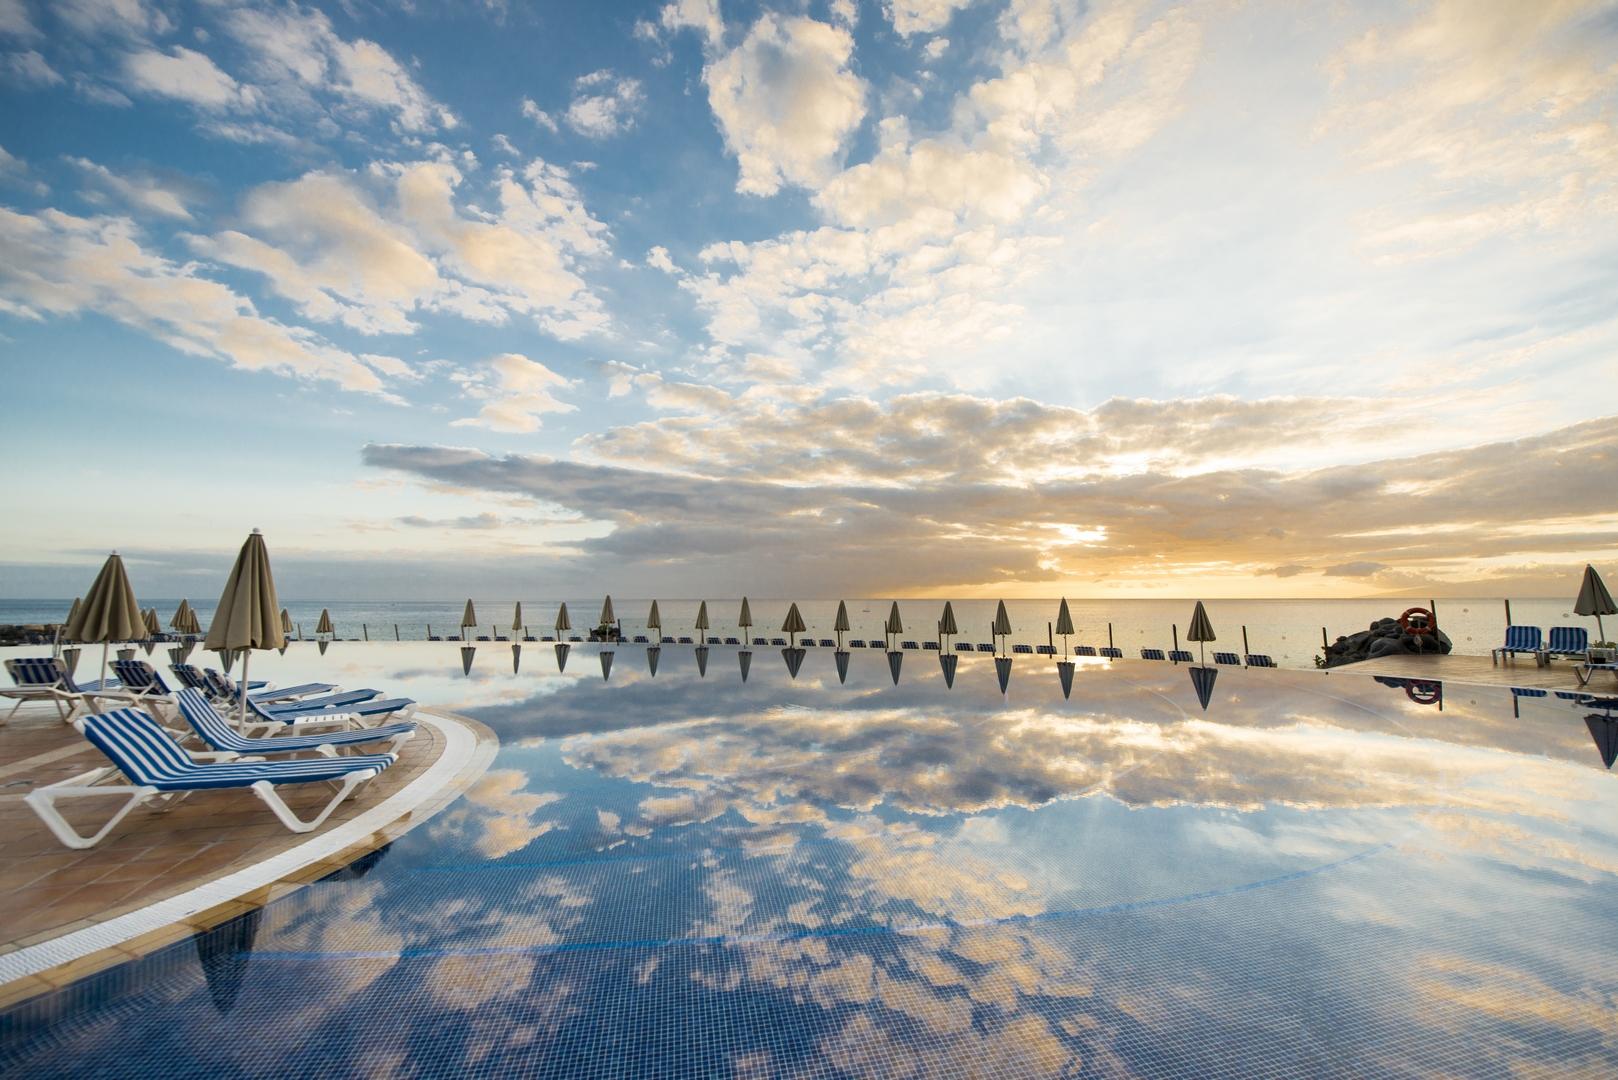 Hotel Sunlight Bahia Prinicpe Costa Adeje, Teneryfa